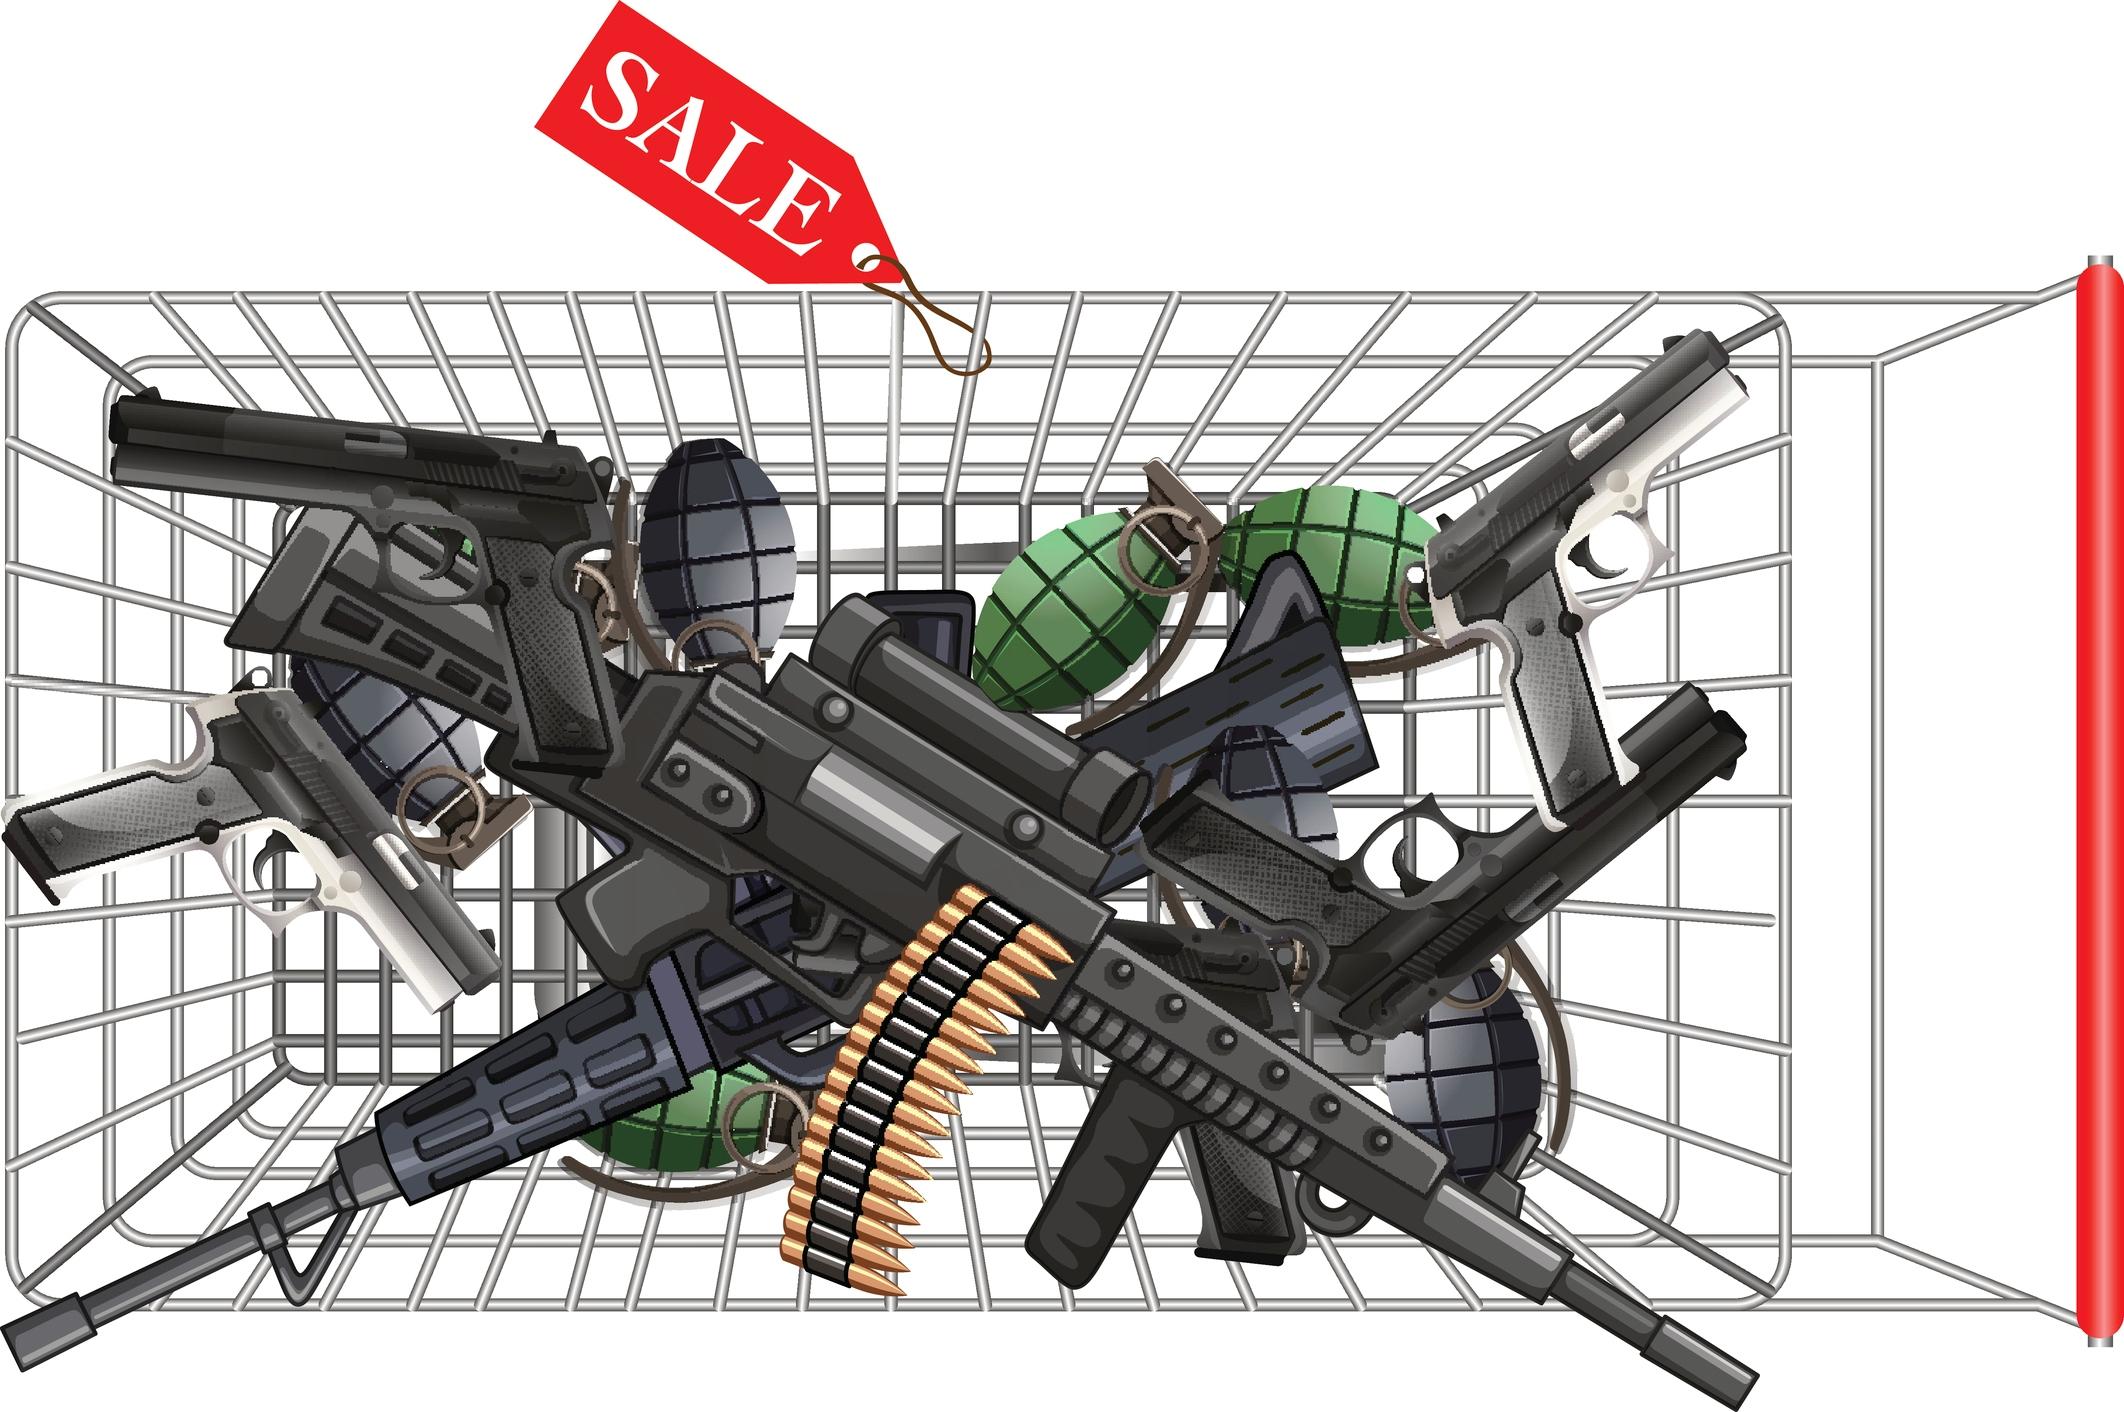 Overhead view of a shopping car full of guns.